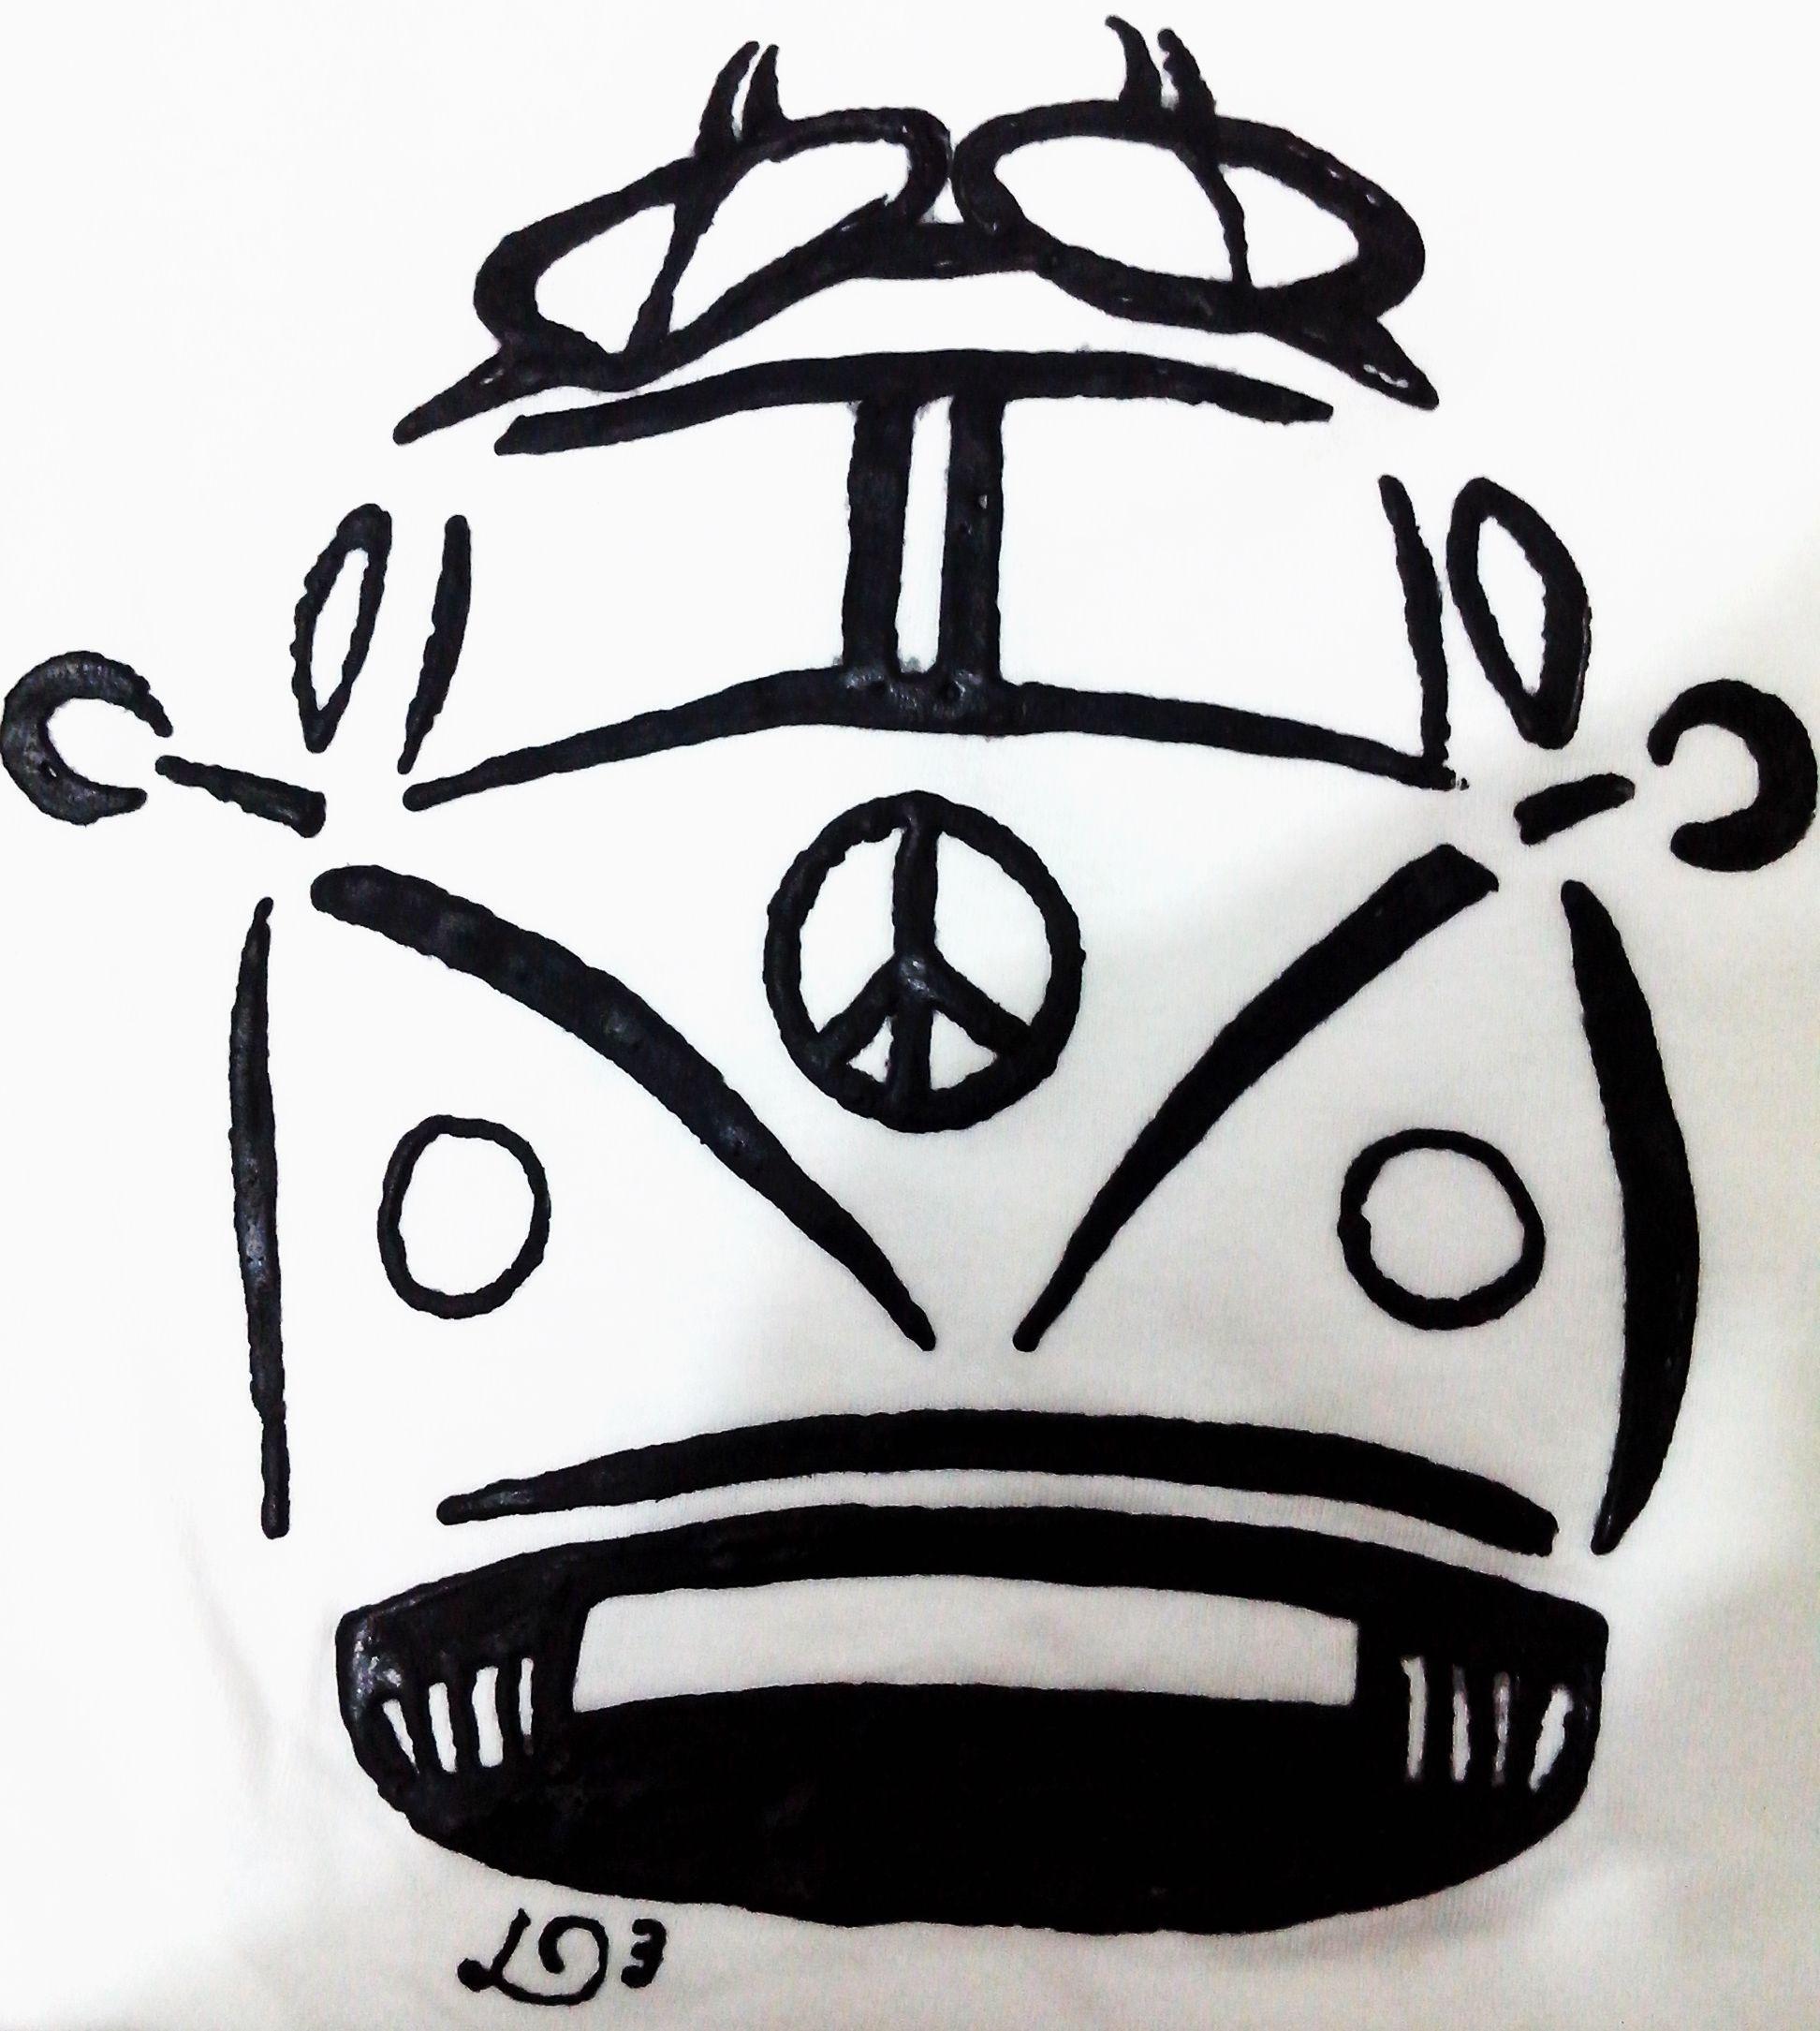 Porsche Baton Rouge >> kombi desenho - Pesquisa Google   Decals   Pinterest   Vw, T1 t2 and Vw bus